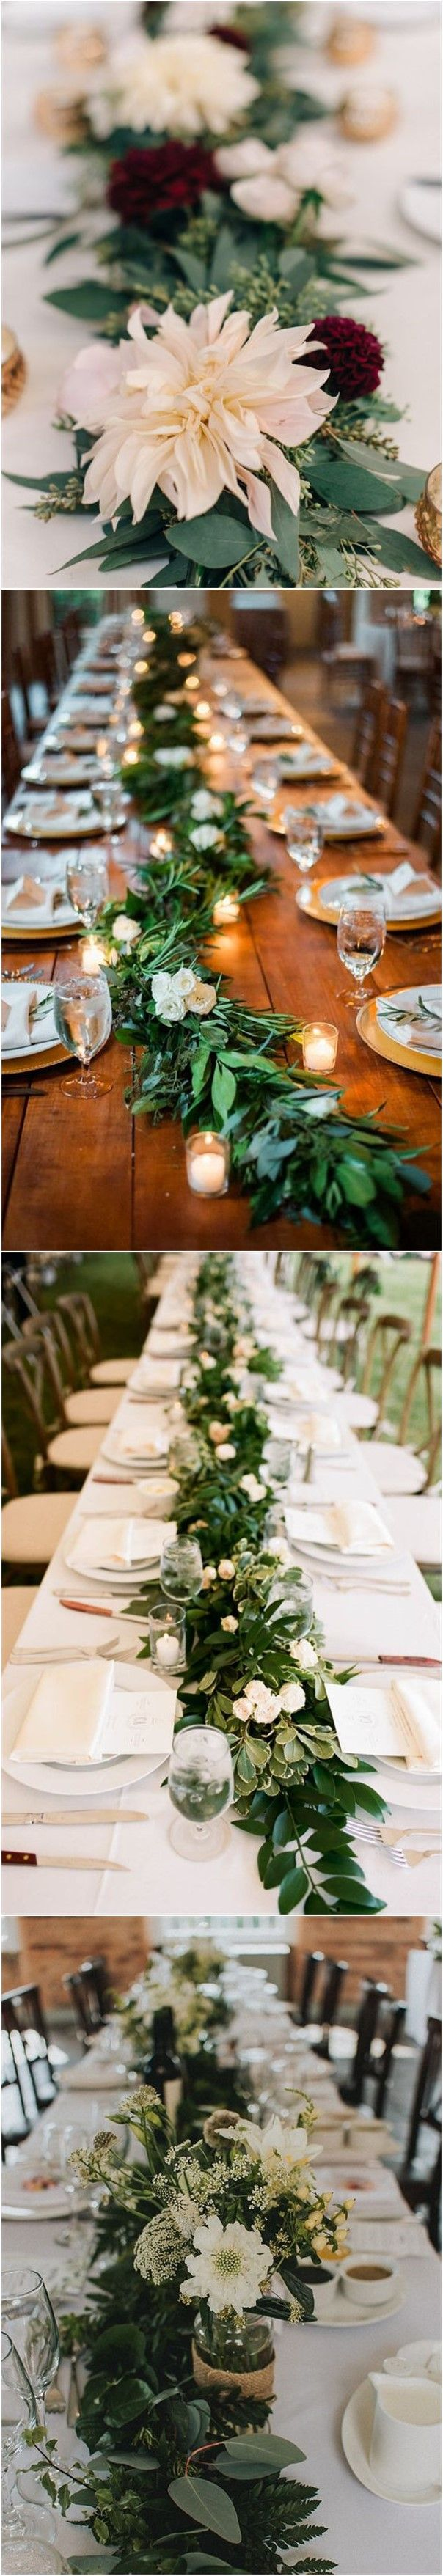 27 best wedding signage & paper goods images on Pinterest